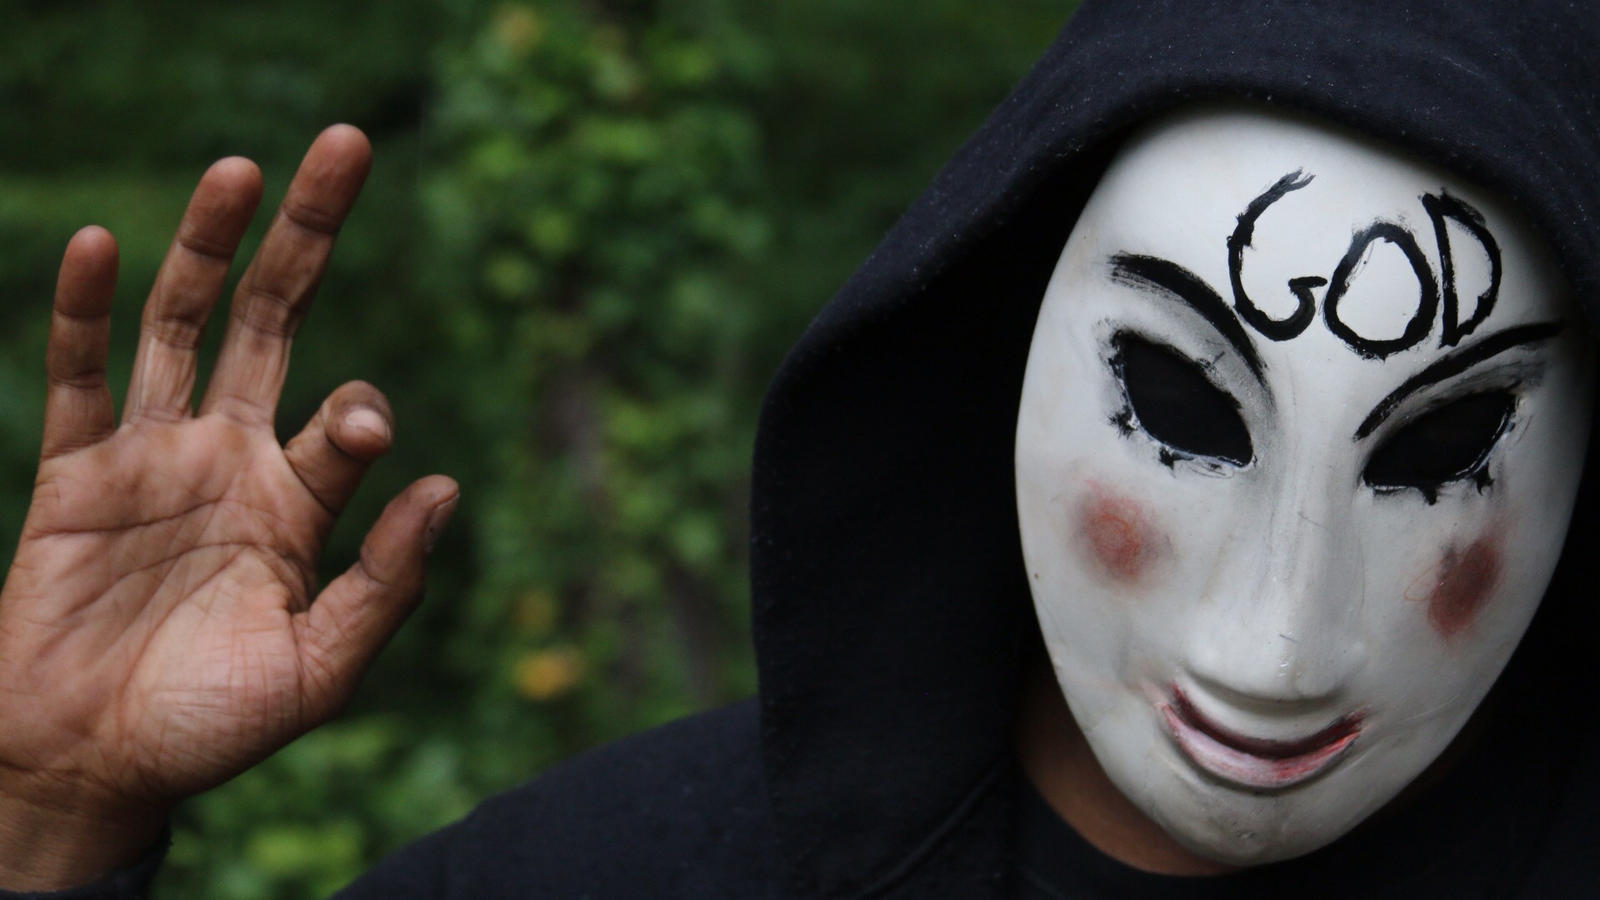 the purge anarchy handmade mask ebay by logikhandtheory - Purge Anarchy Masks For Halloween